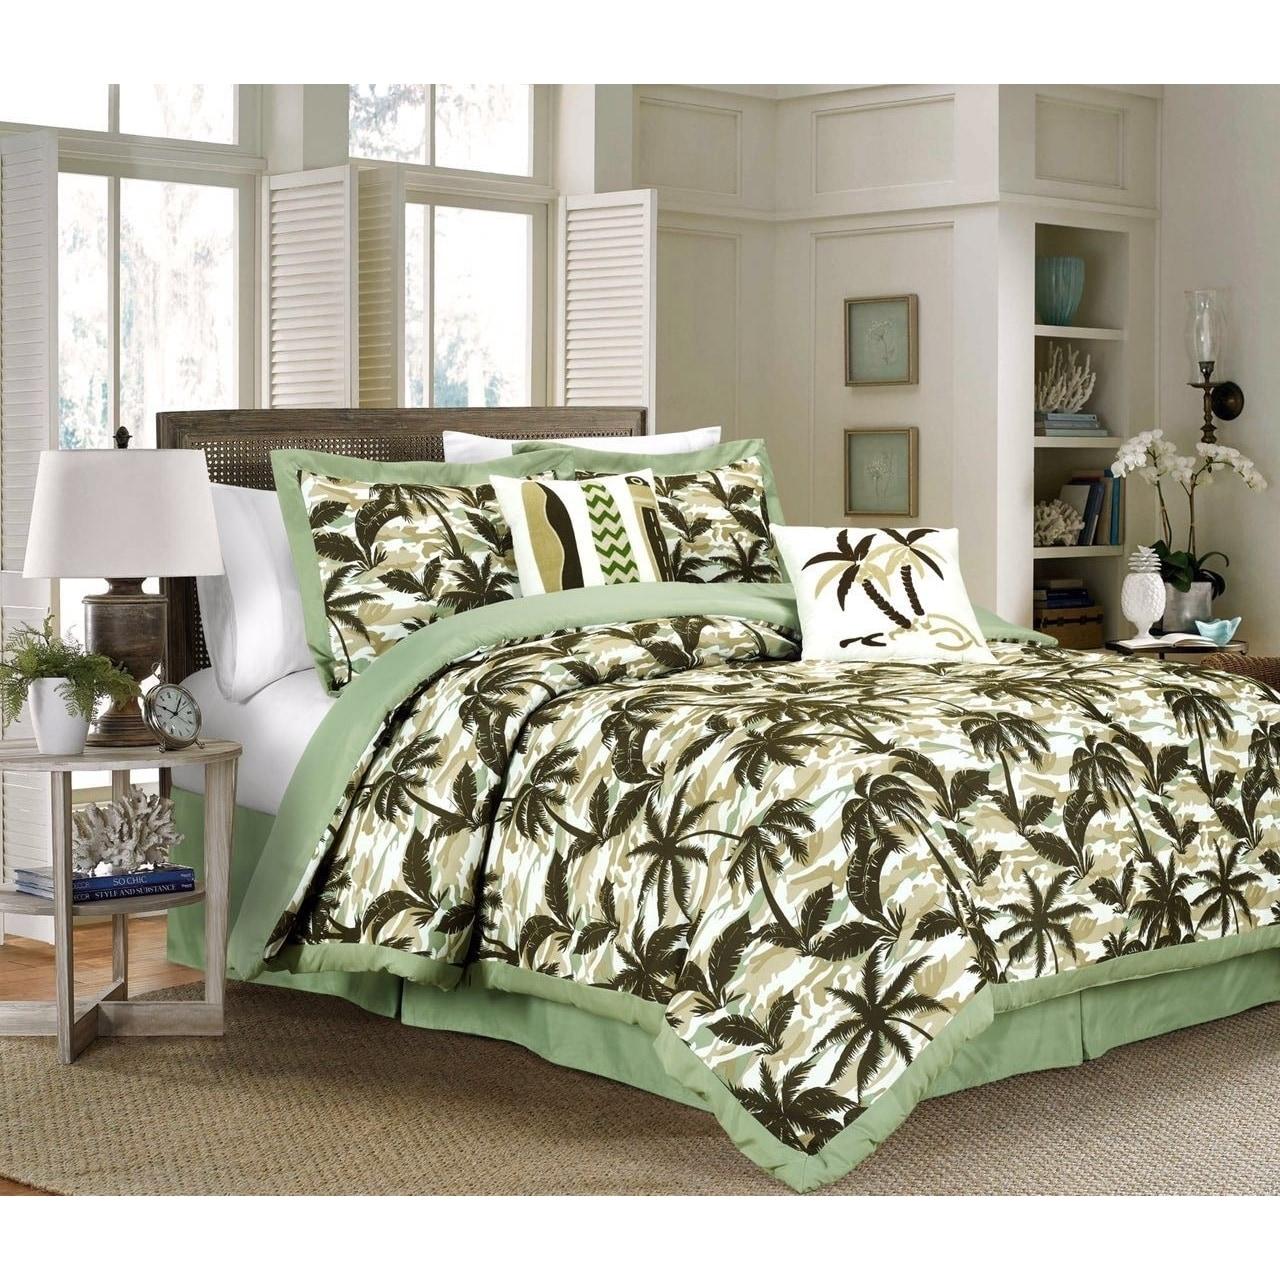 French Impression Kona 6 Piece Printed Comforter Set With...